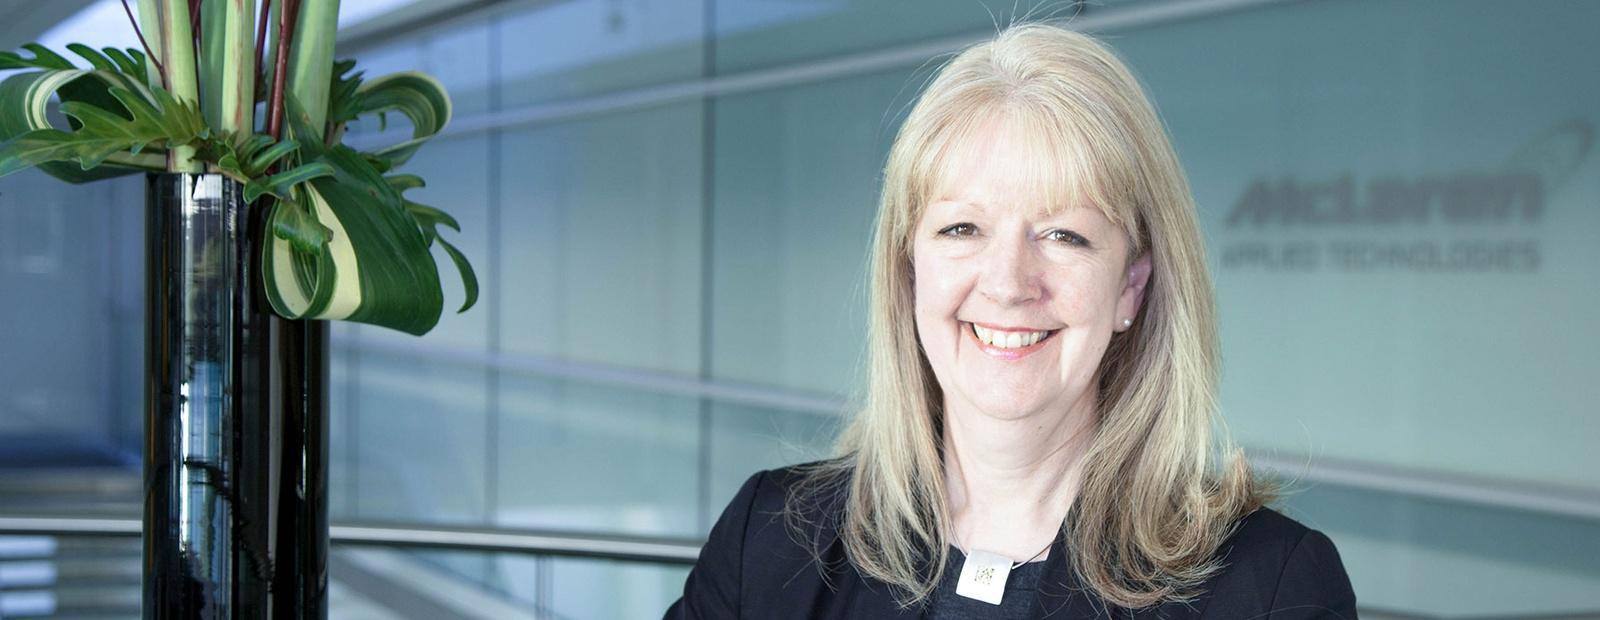 CELIA GAFFNEY JOINS McLAREN APPLIED TECHNOLOGIES AS COO